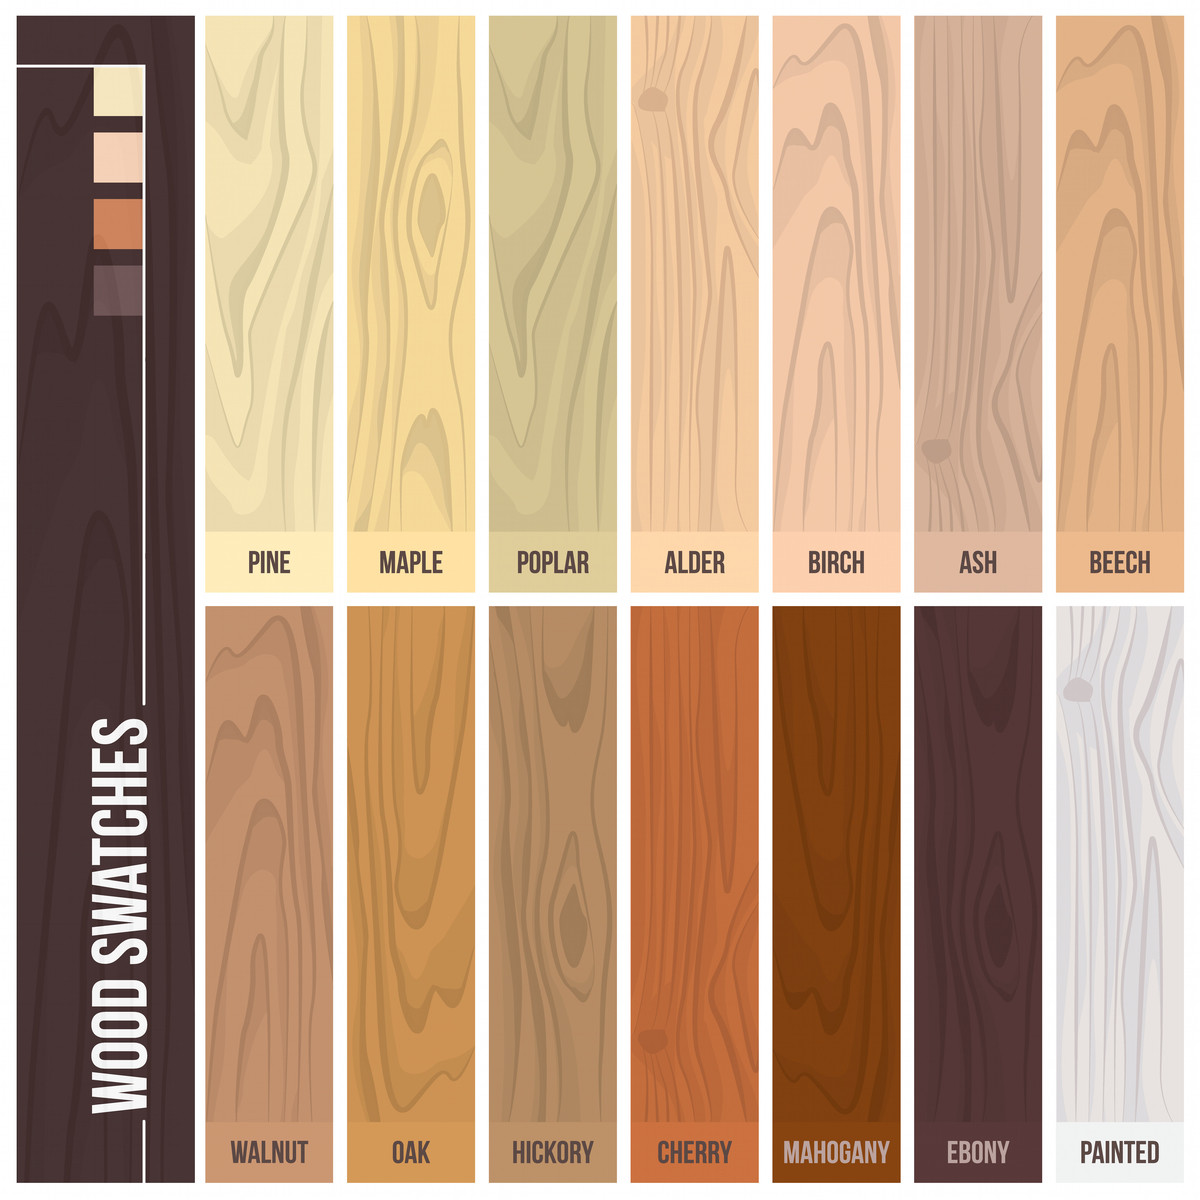 change hardwood floor stain color of 12 types of hardwood flooring species styles edging dimensions throughout types of hardwood flooring illustrated guide